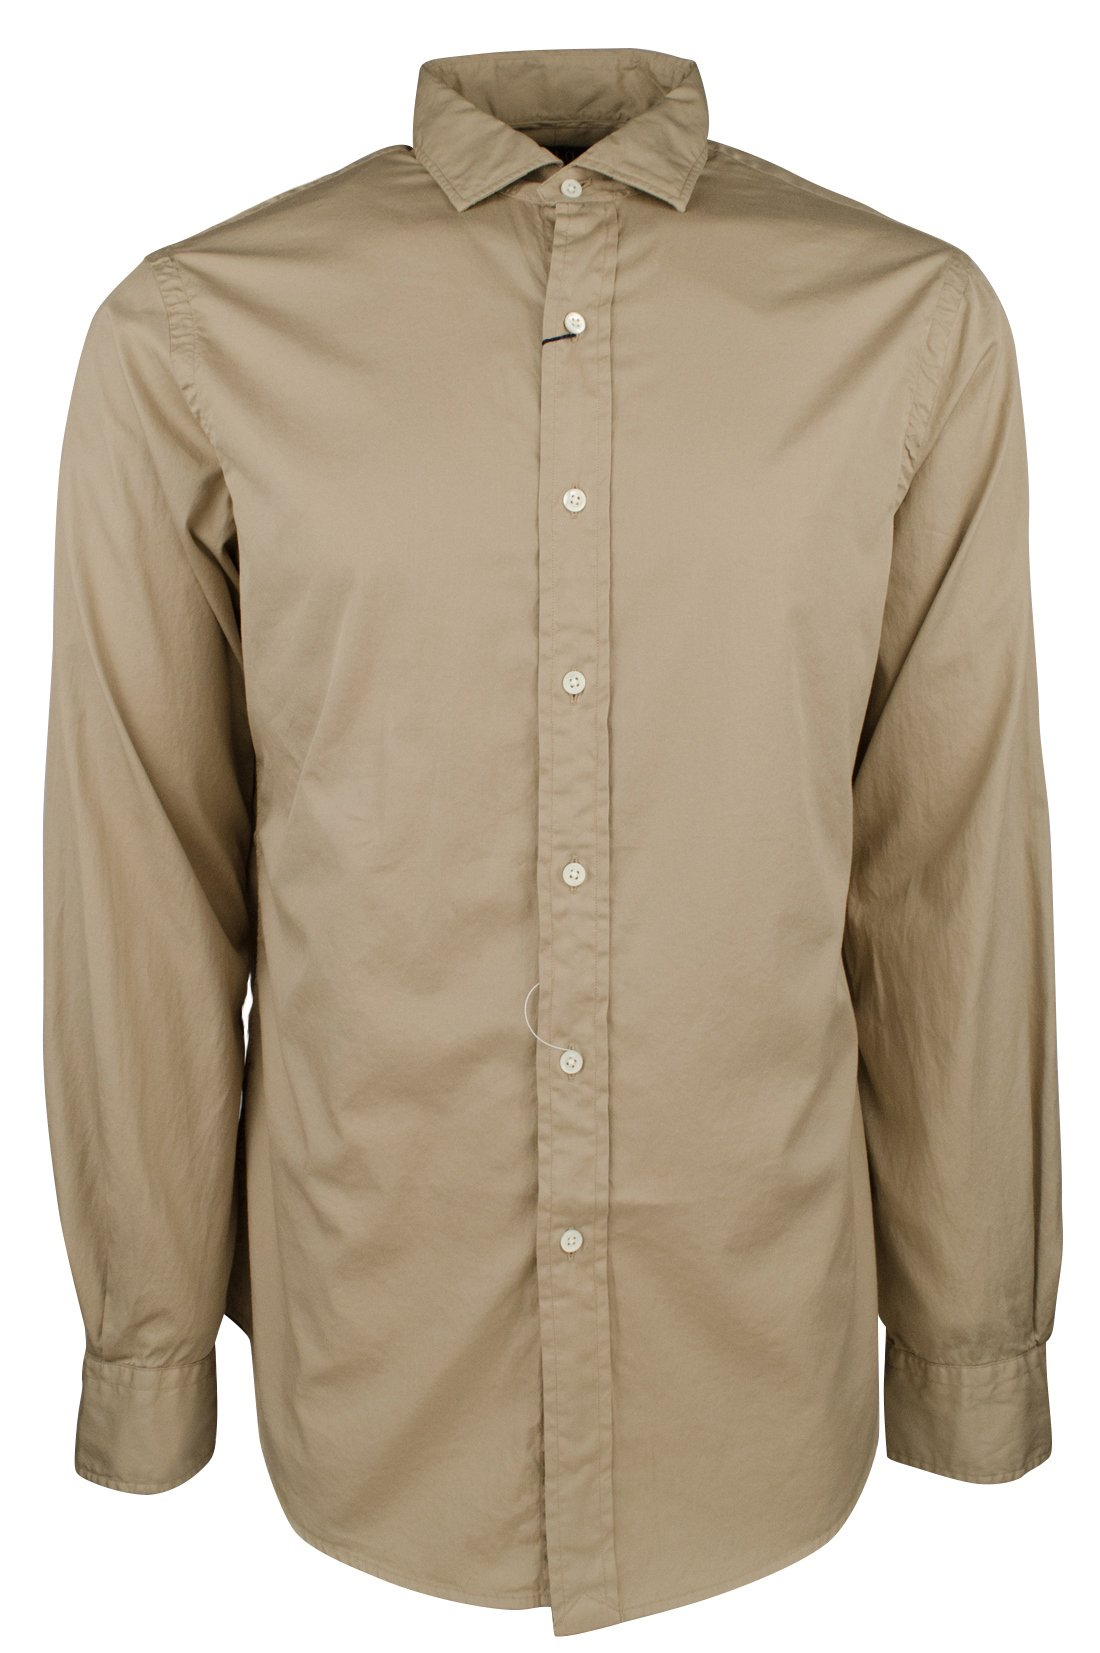 Polo Ralph Lauren Men's Slim Fit Cotton Twill Shirt-CB-XL